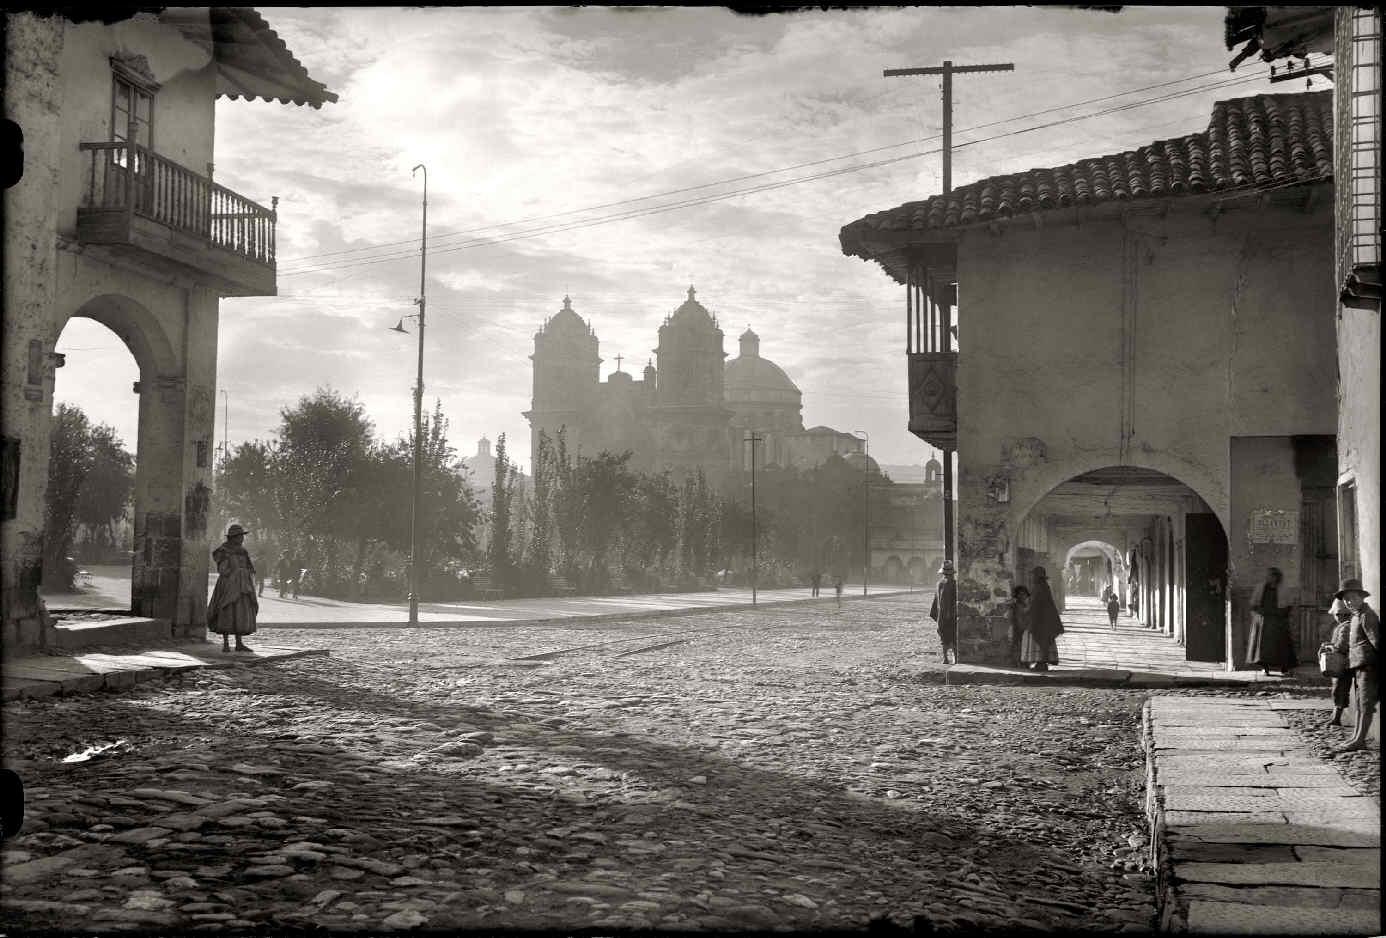 CHAMBI, Martín, <i>Amanecer en la Plaza de Armas</i>